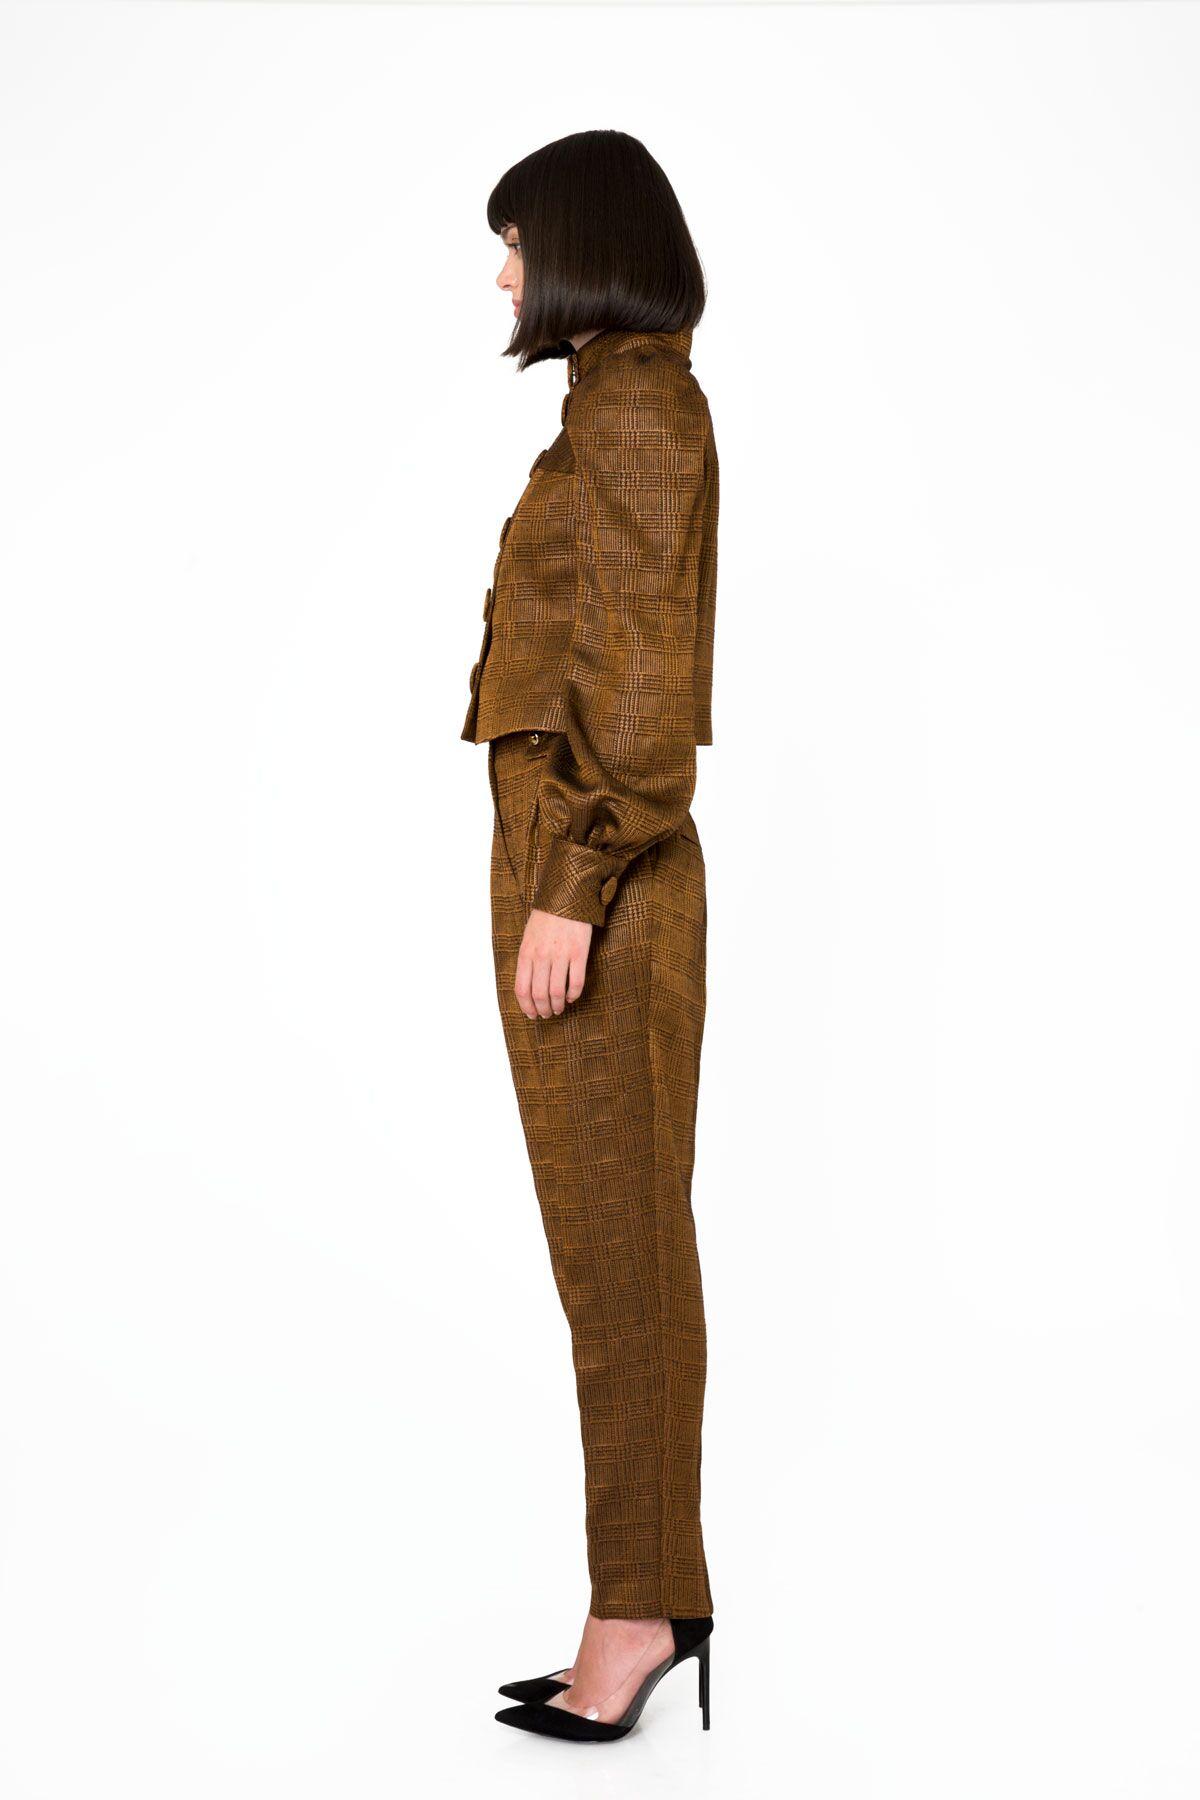 Yüksek Bel Metalik Kumaş Havuç Pantolon